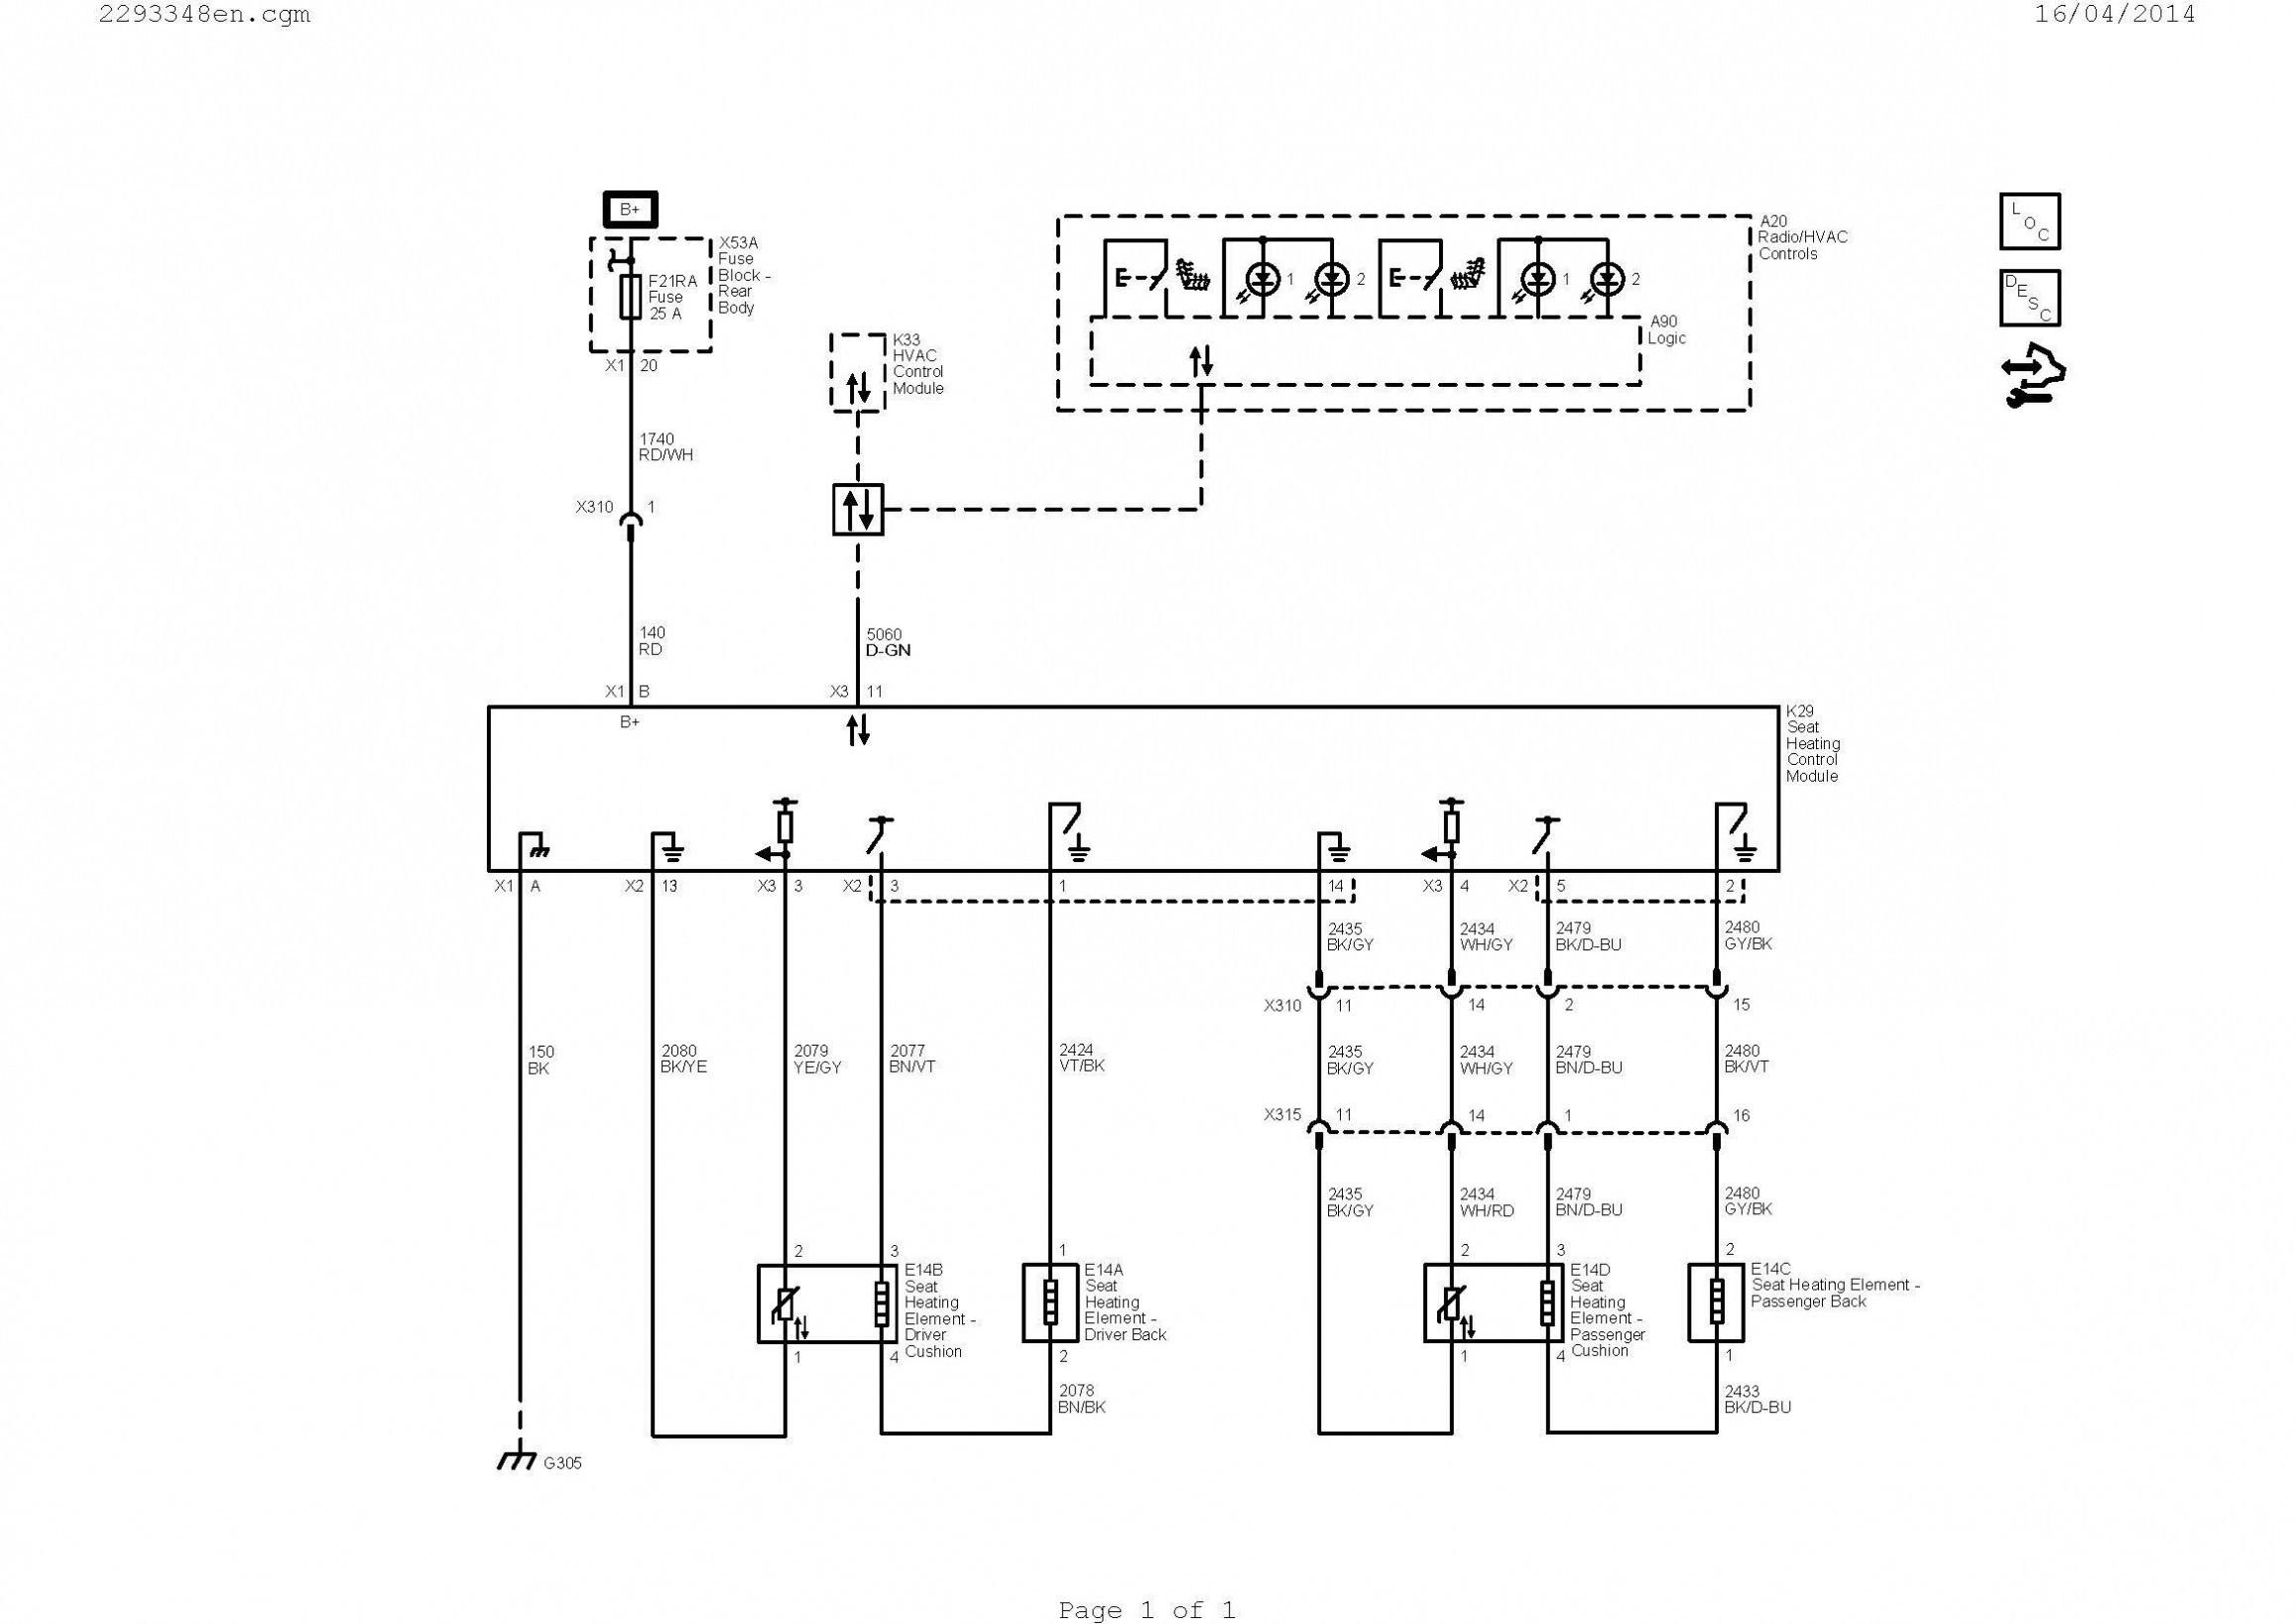 1995 Acura Integra Engine    Diagram      My    Wiring       DIagram